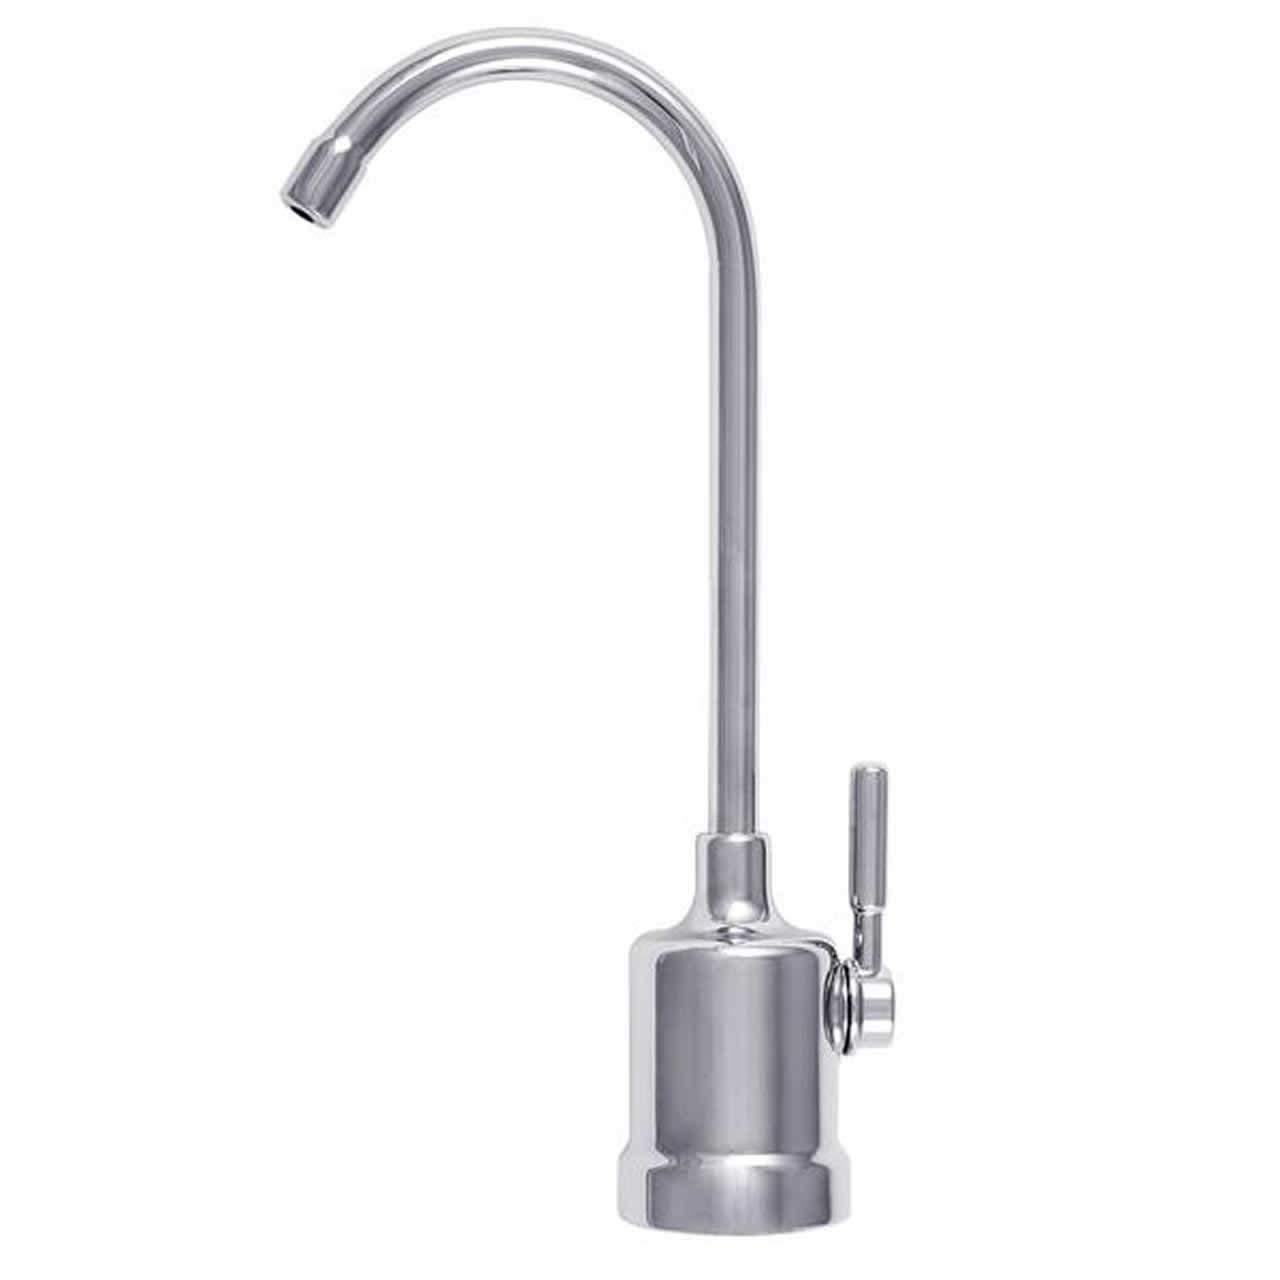 Watts Premier WP116095 Faucet Brushed Nickel